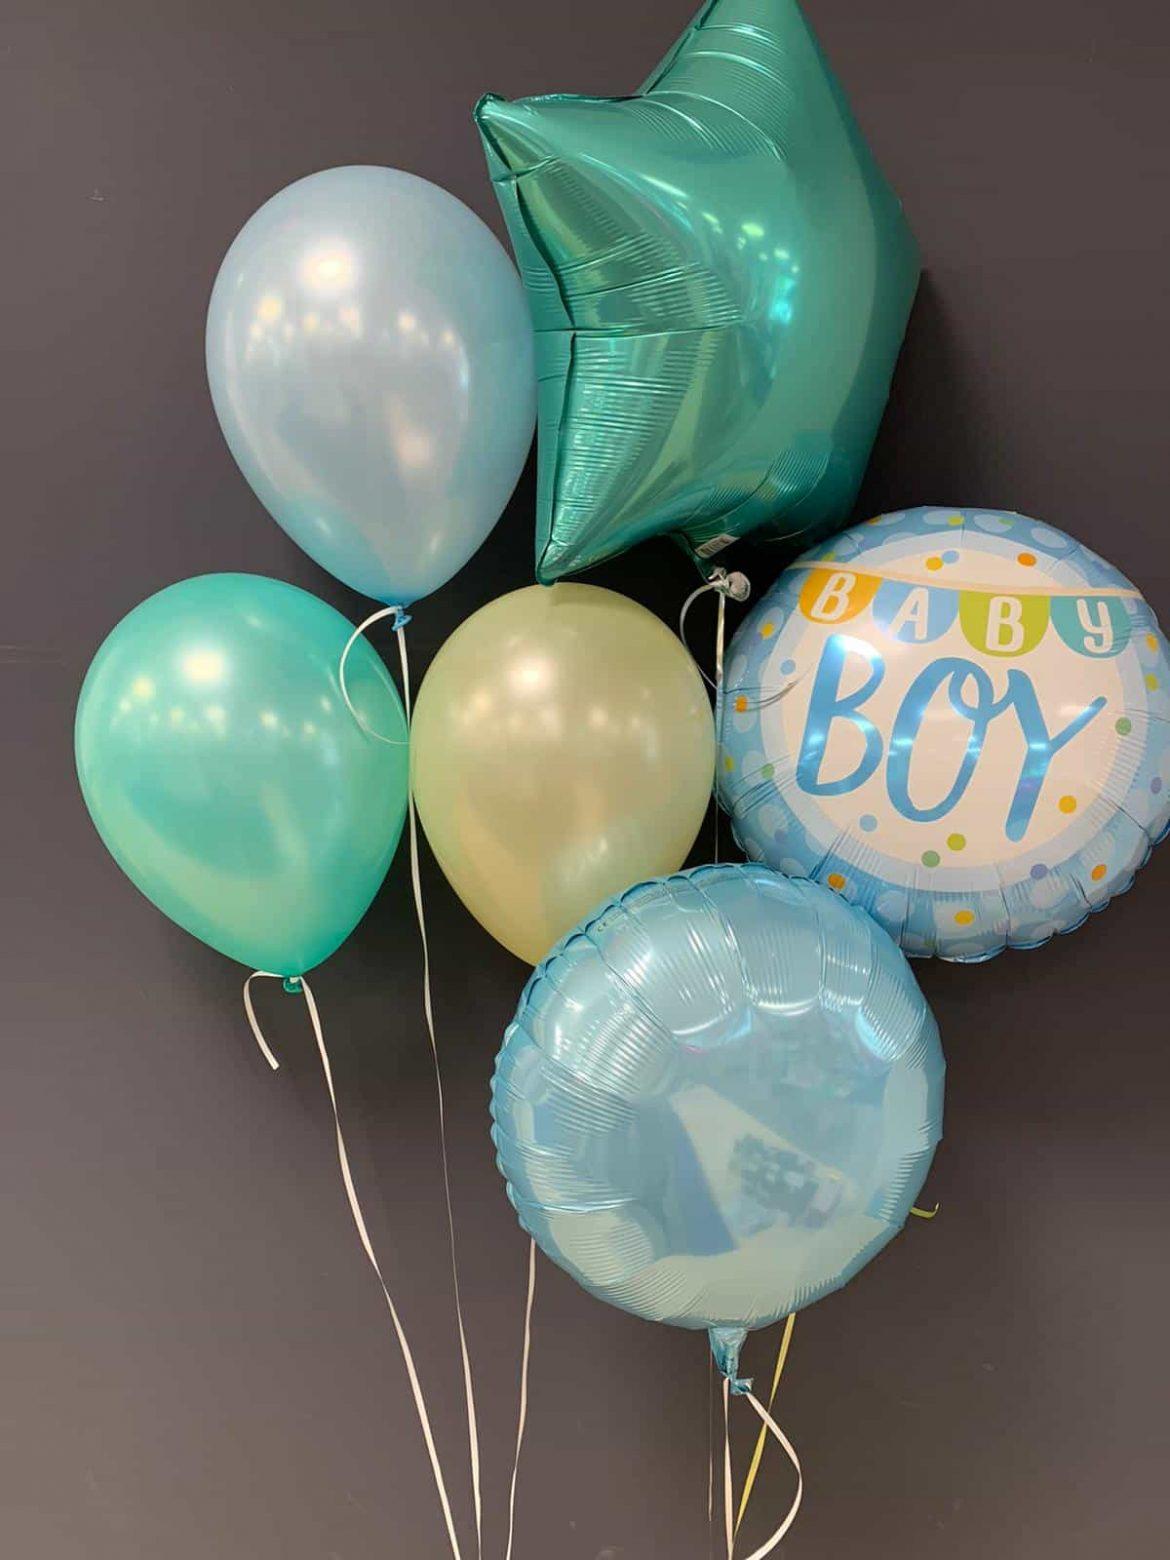 Baby Boy €5,50<br />Dekoballons €4,50<br />Latexballons €1,95 1